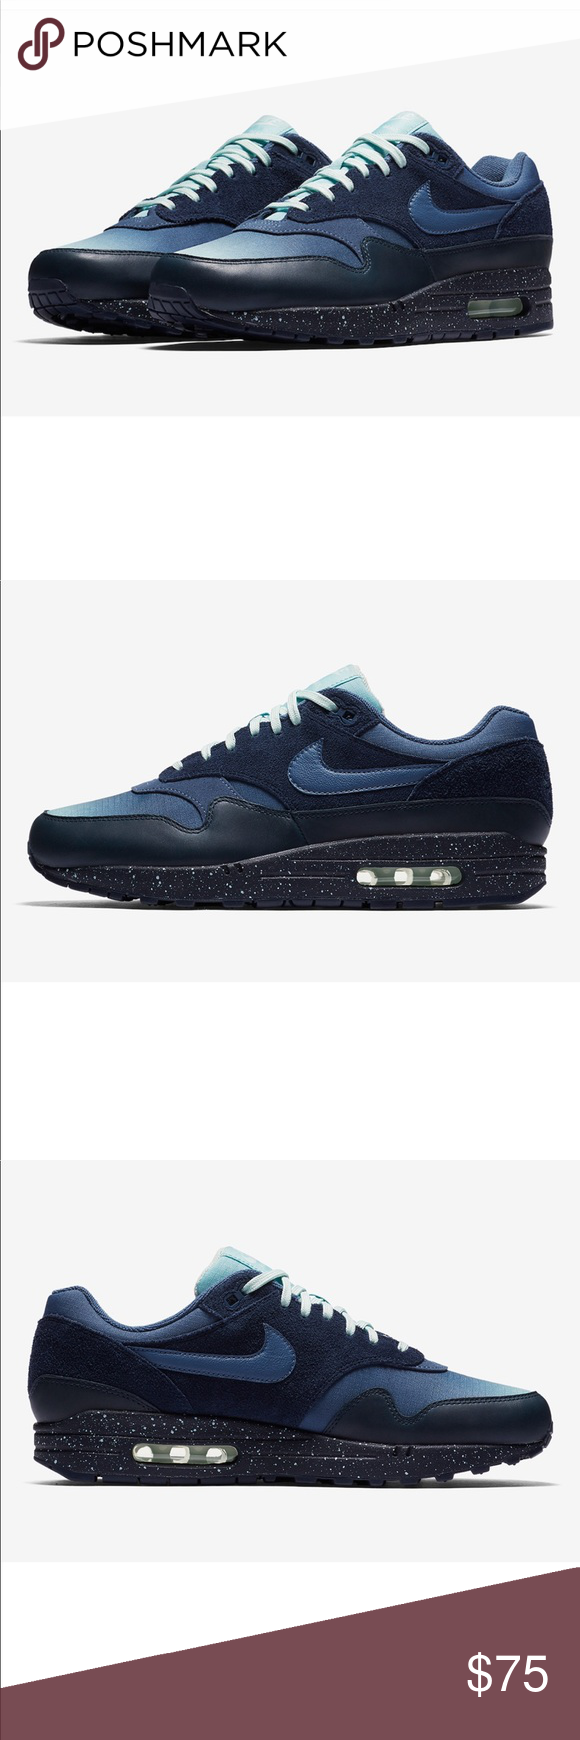 best service cdf37 fd86c Mens Nike Air max 1 premium gradient toe size 9